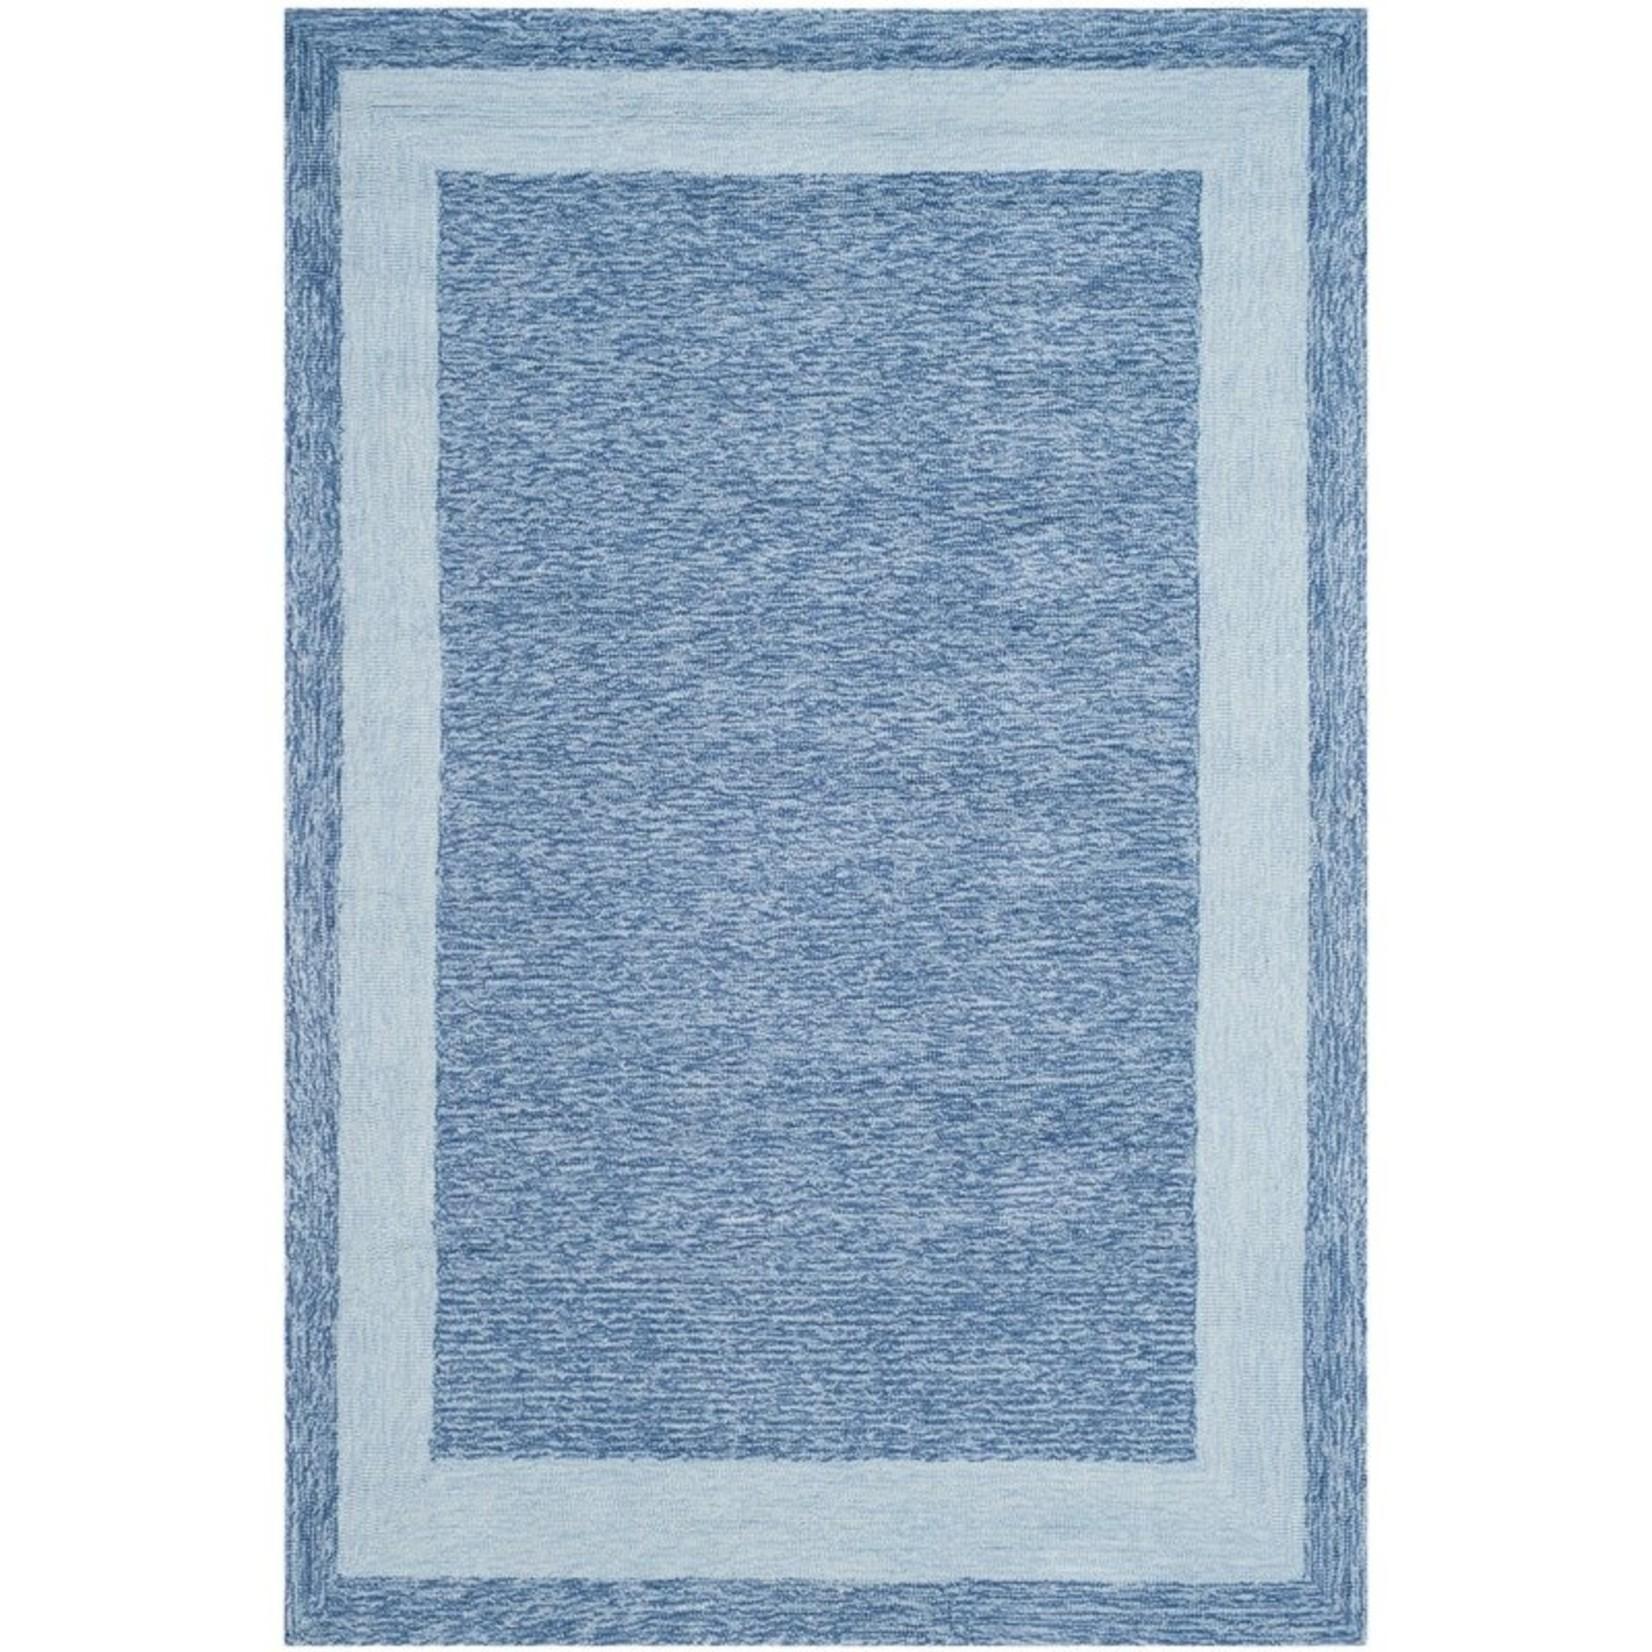 *3' x 5' - Liadan Hand-Hooked Blue Area Rug